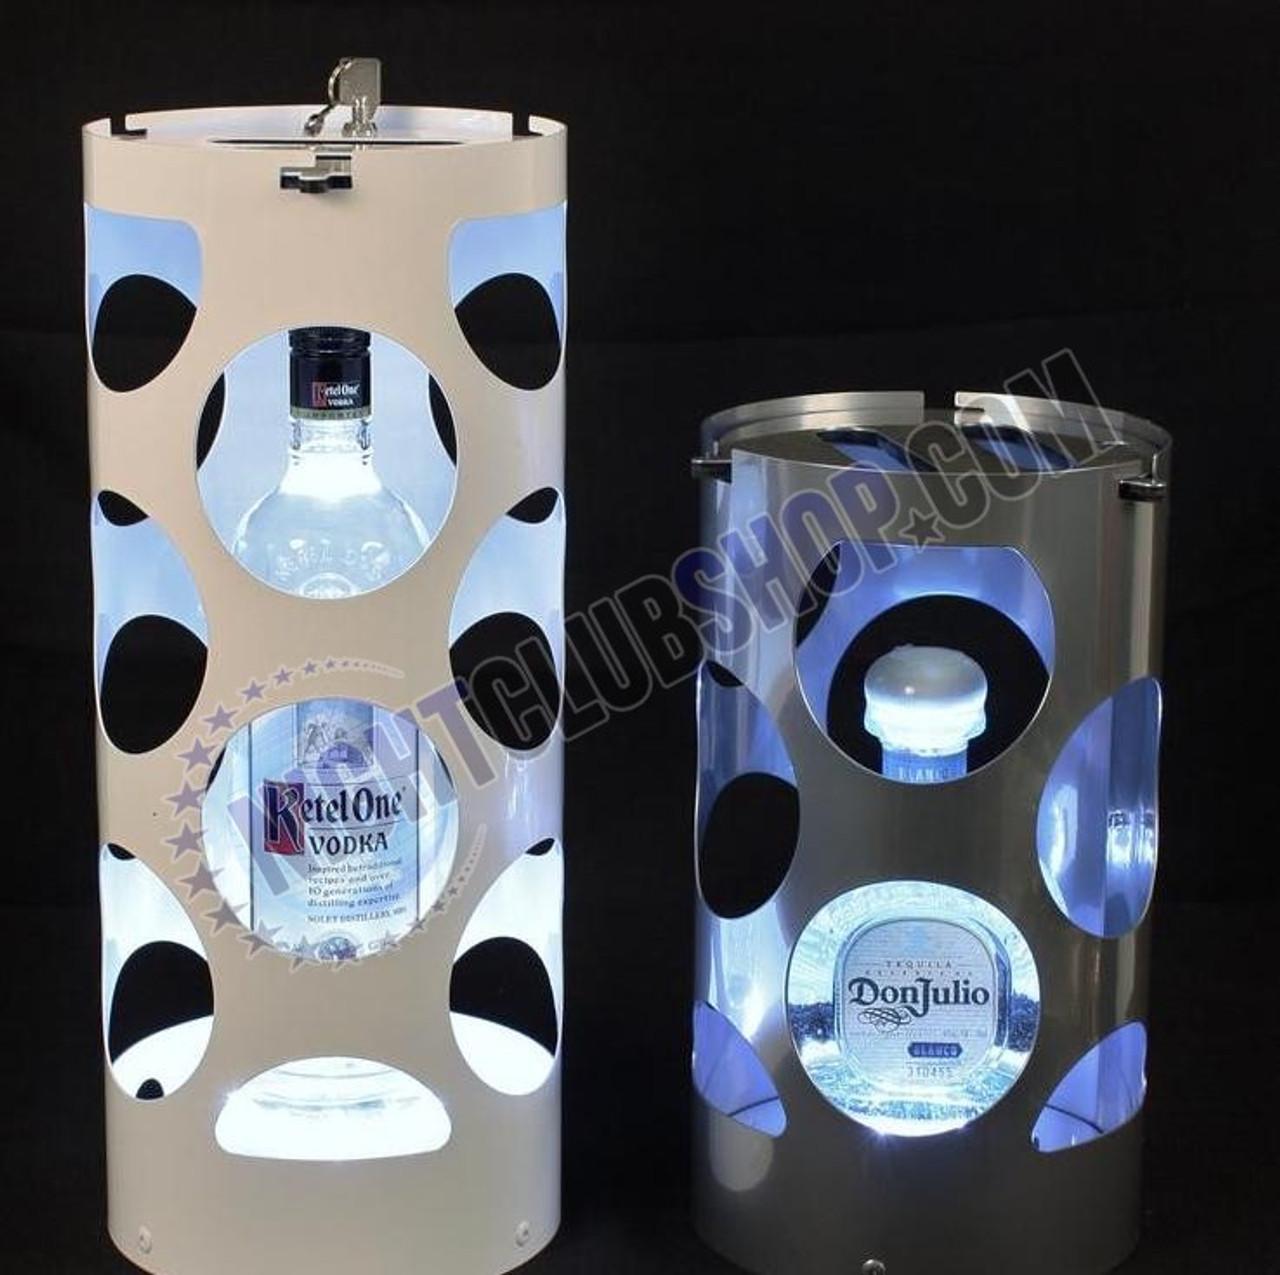 Steel, Metal, Patrons, North Carolina, Virginia, Cages, LED, Huge, Medium, Small, Custom, Club, Spirits, Bar, Casino, Lock, Box, Key, Locking